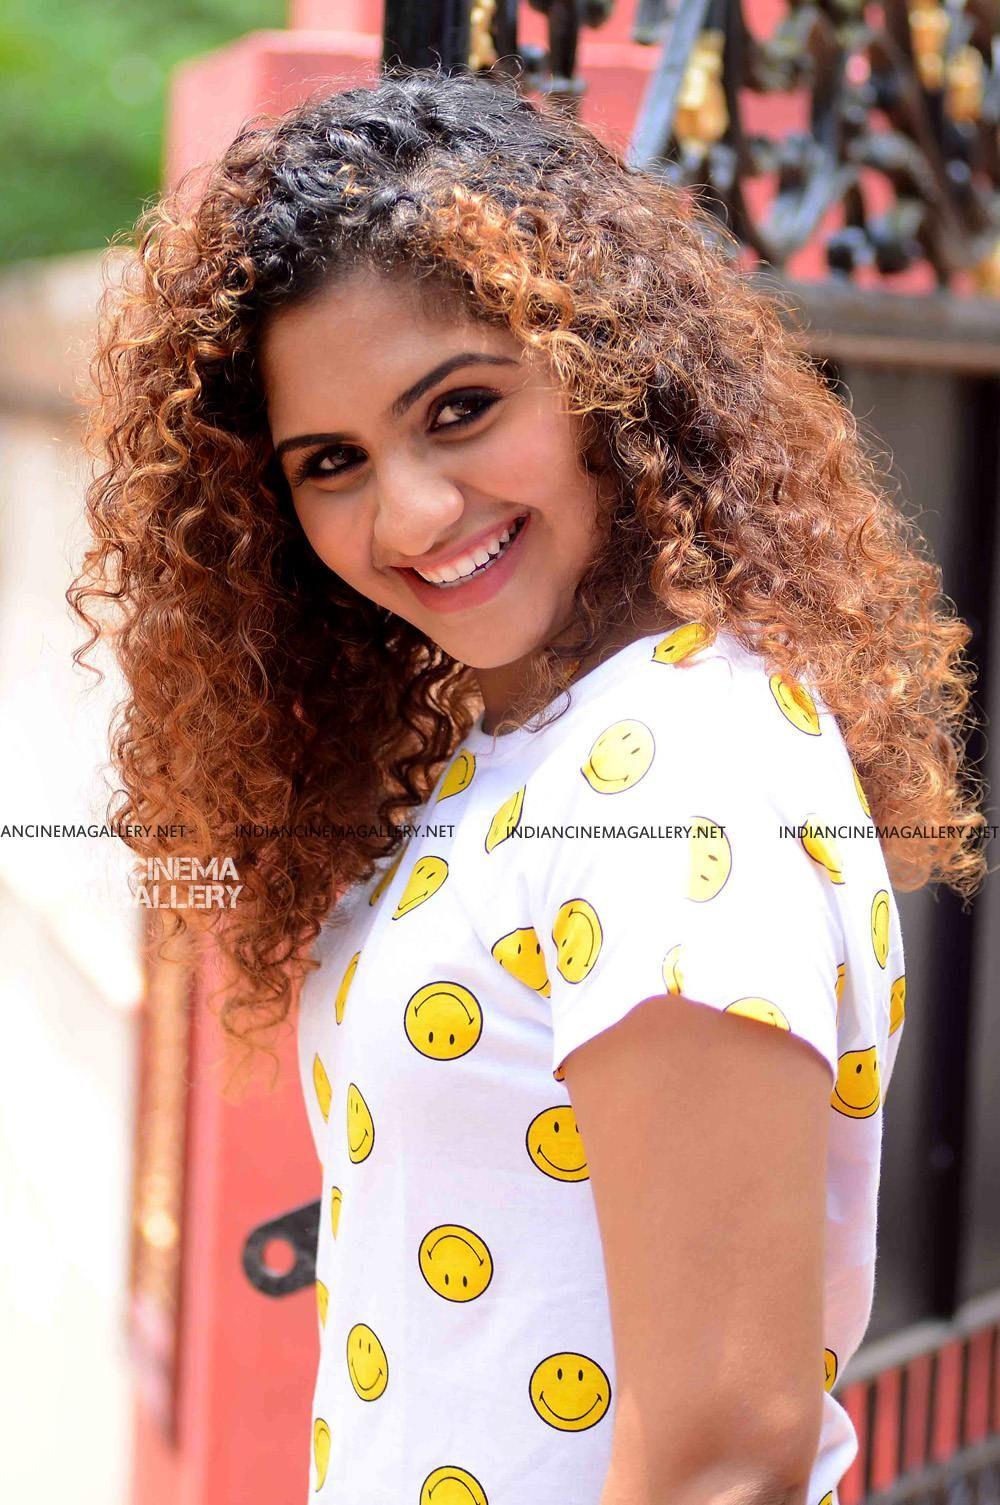 Noorin Shereef Photoshoot March 2019 4 Beautiful Indian Actress Indian Actress Hot Pics Indian Actress Photos